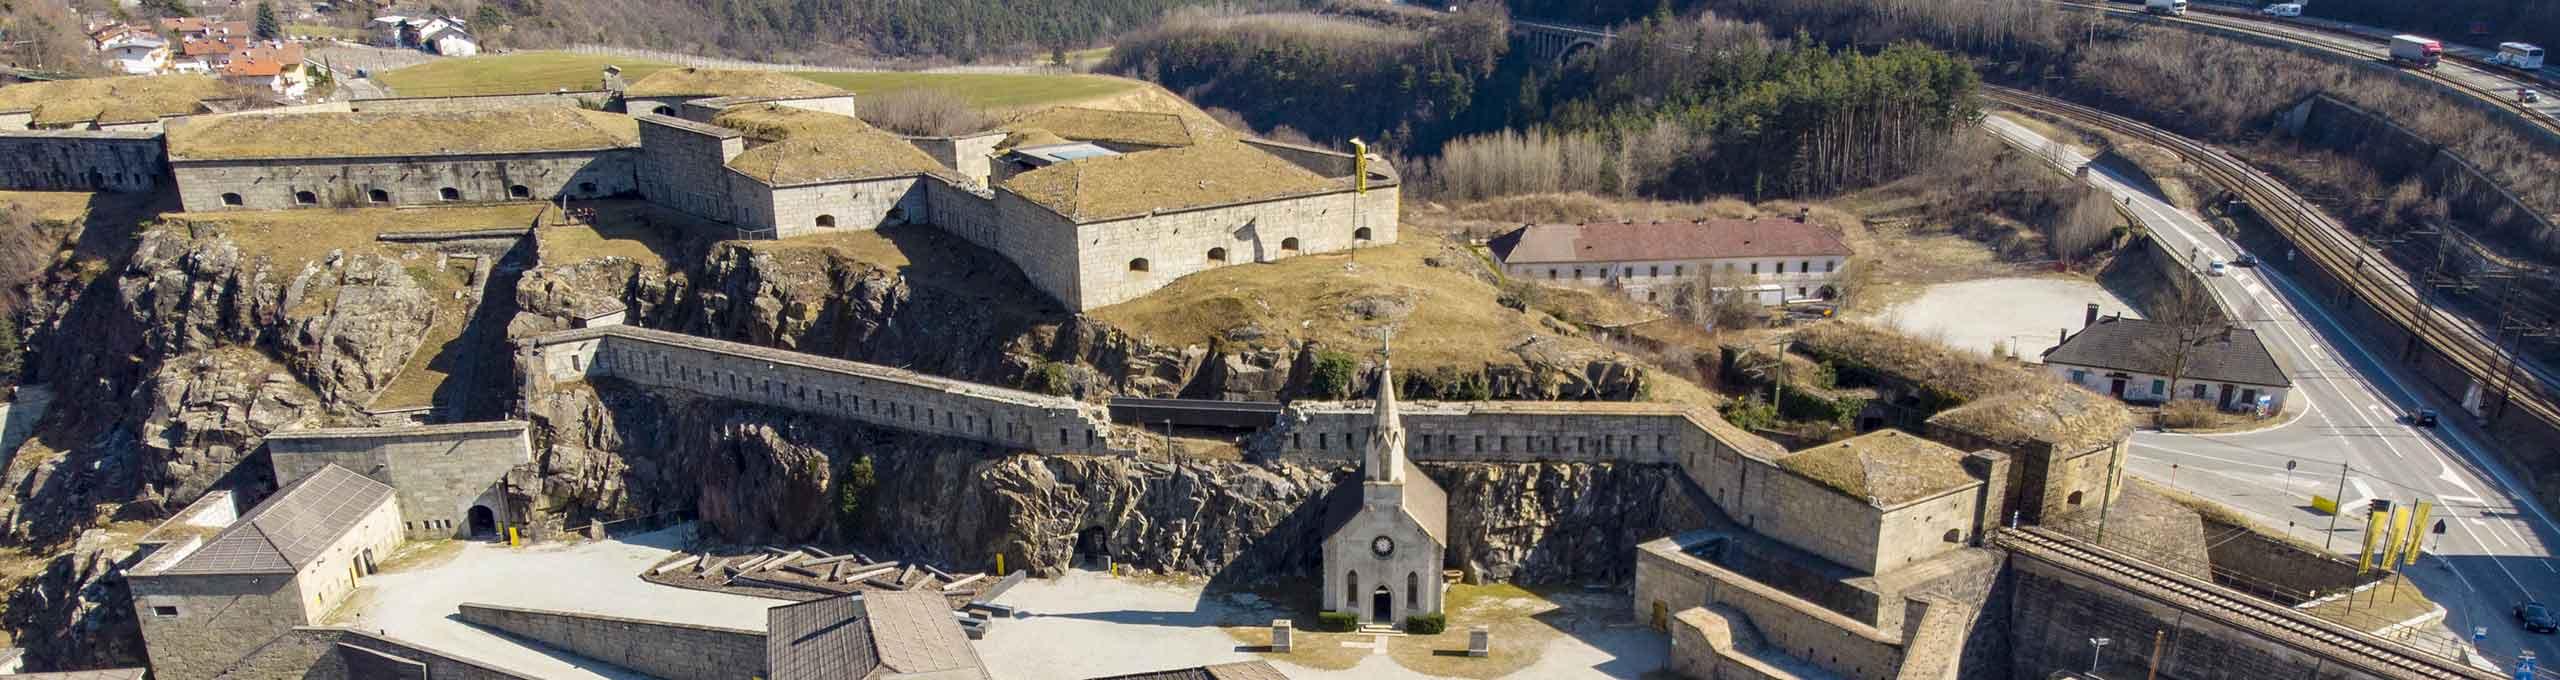 Fortificazioni austriache